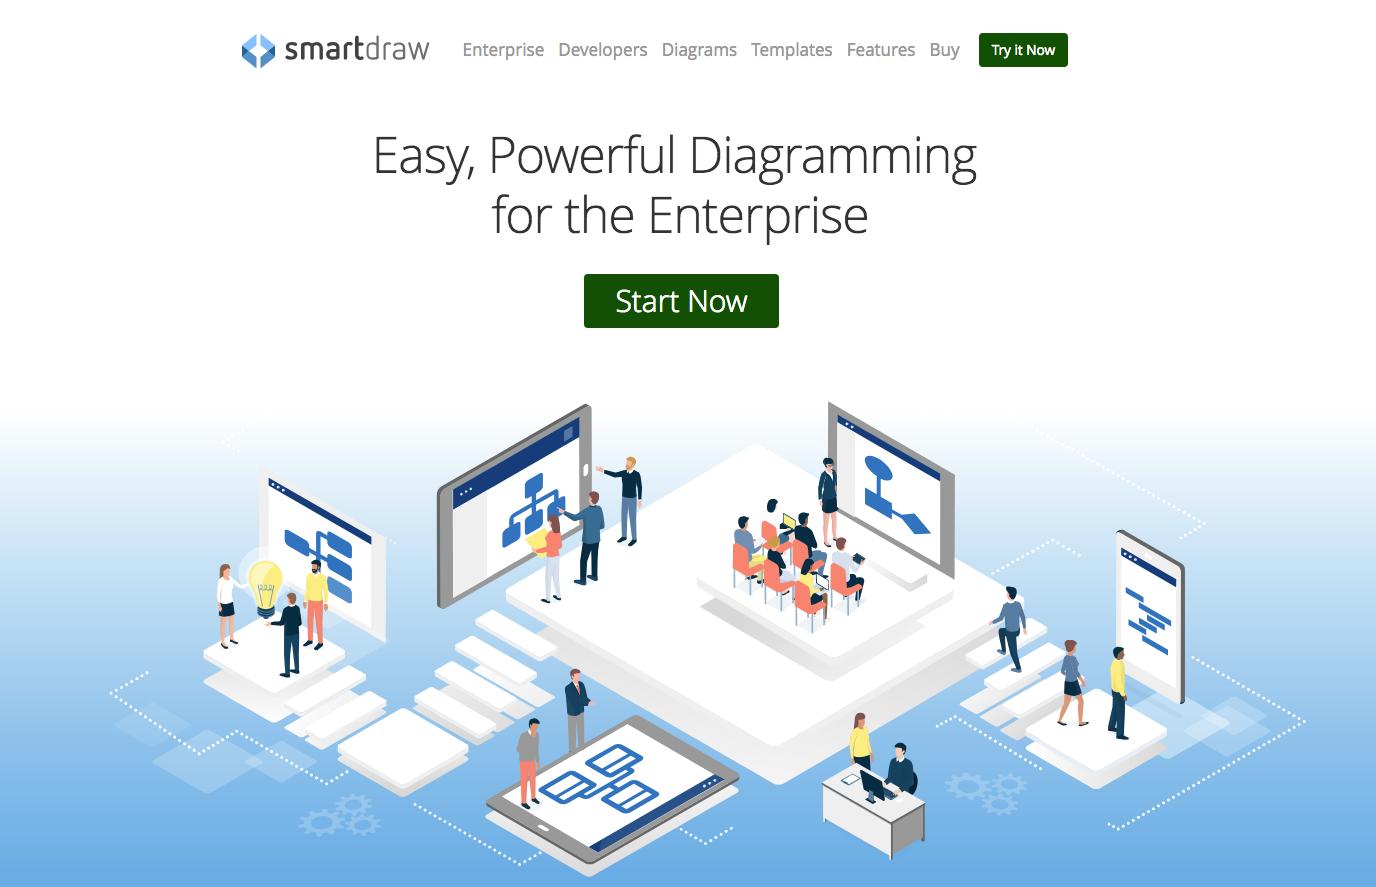 Análisis DAFO con smartdraw